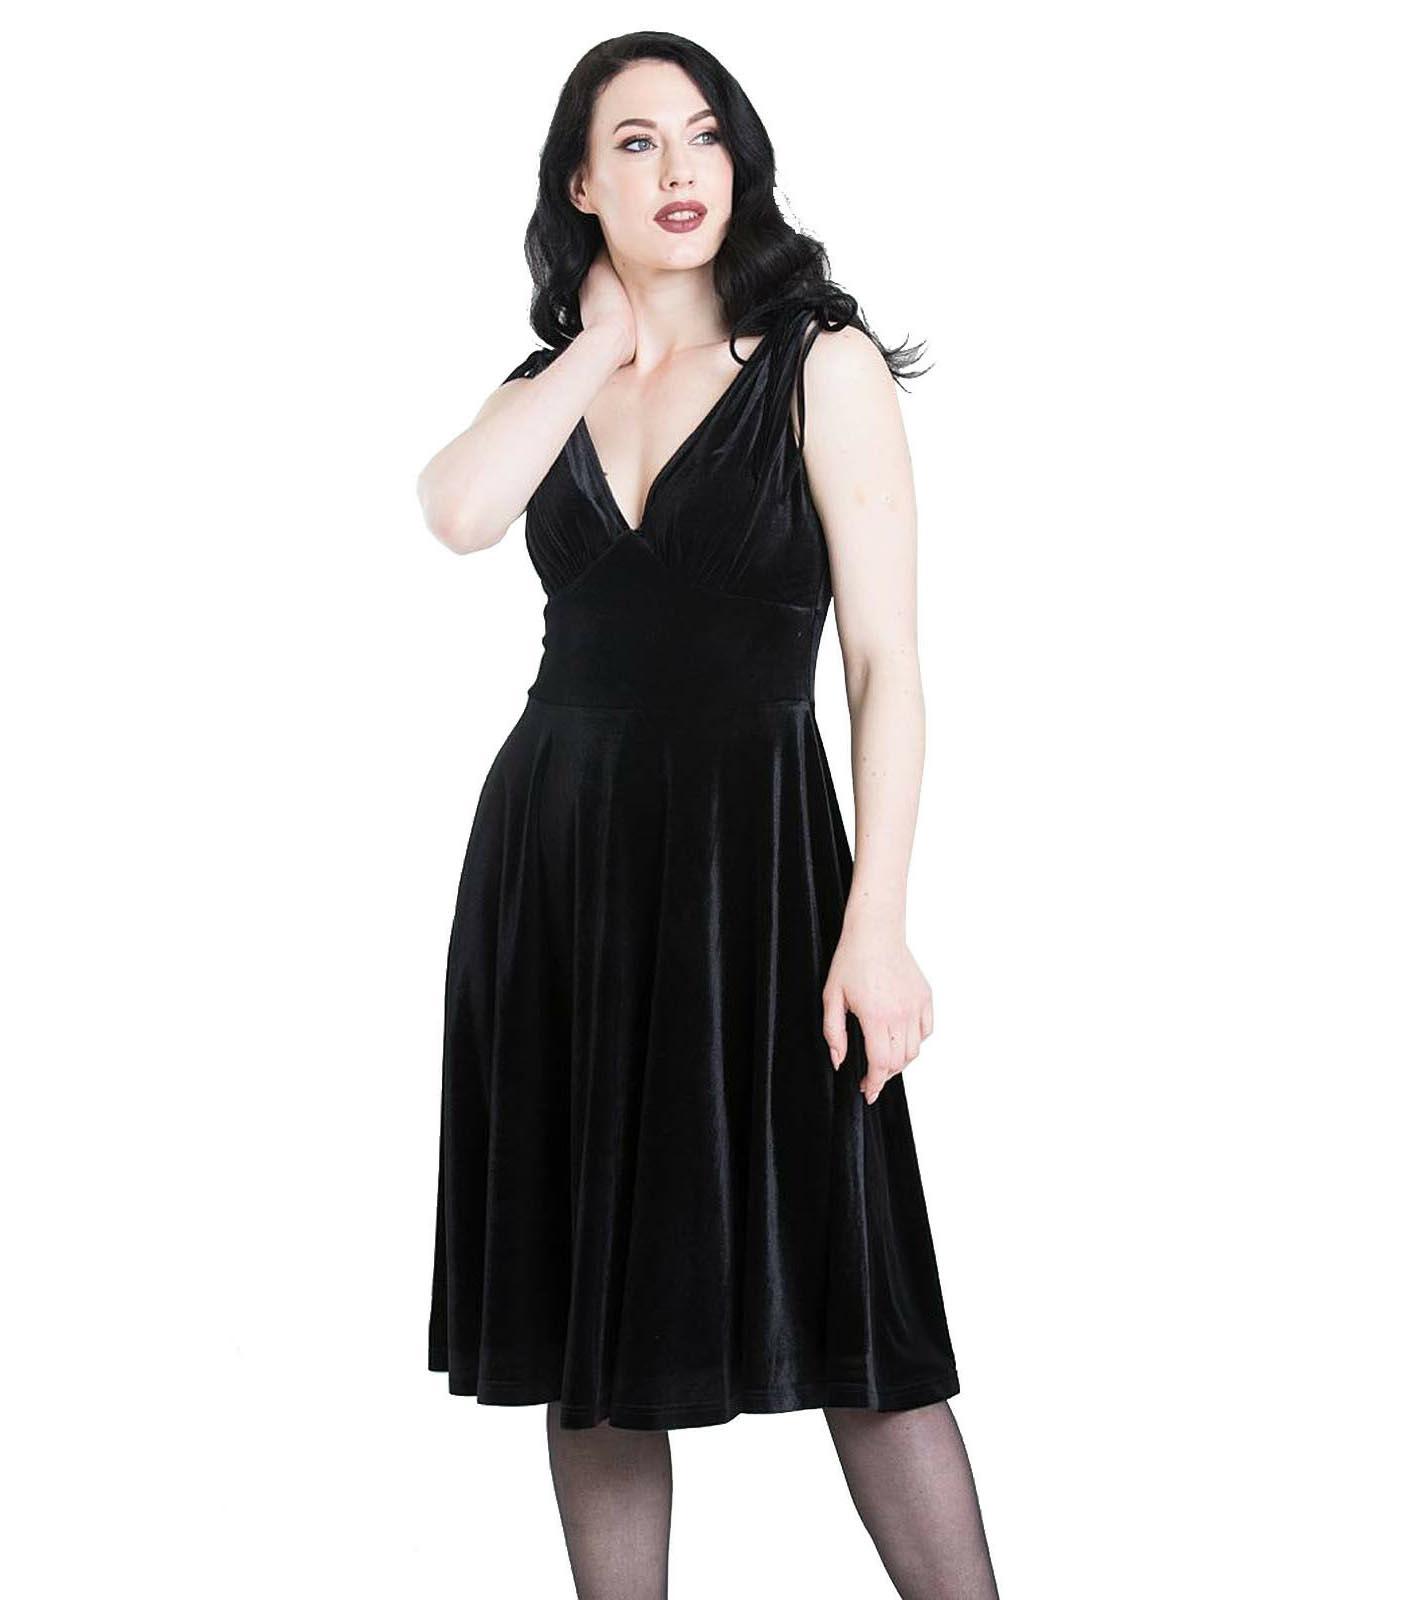 Hell-Bunny-40s-50s-Elegant-Pin-Up-Dress-MELINA-Crushed-Velvet-Black-All-Sizes thumbnail 3